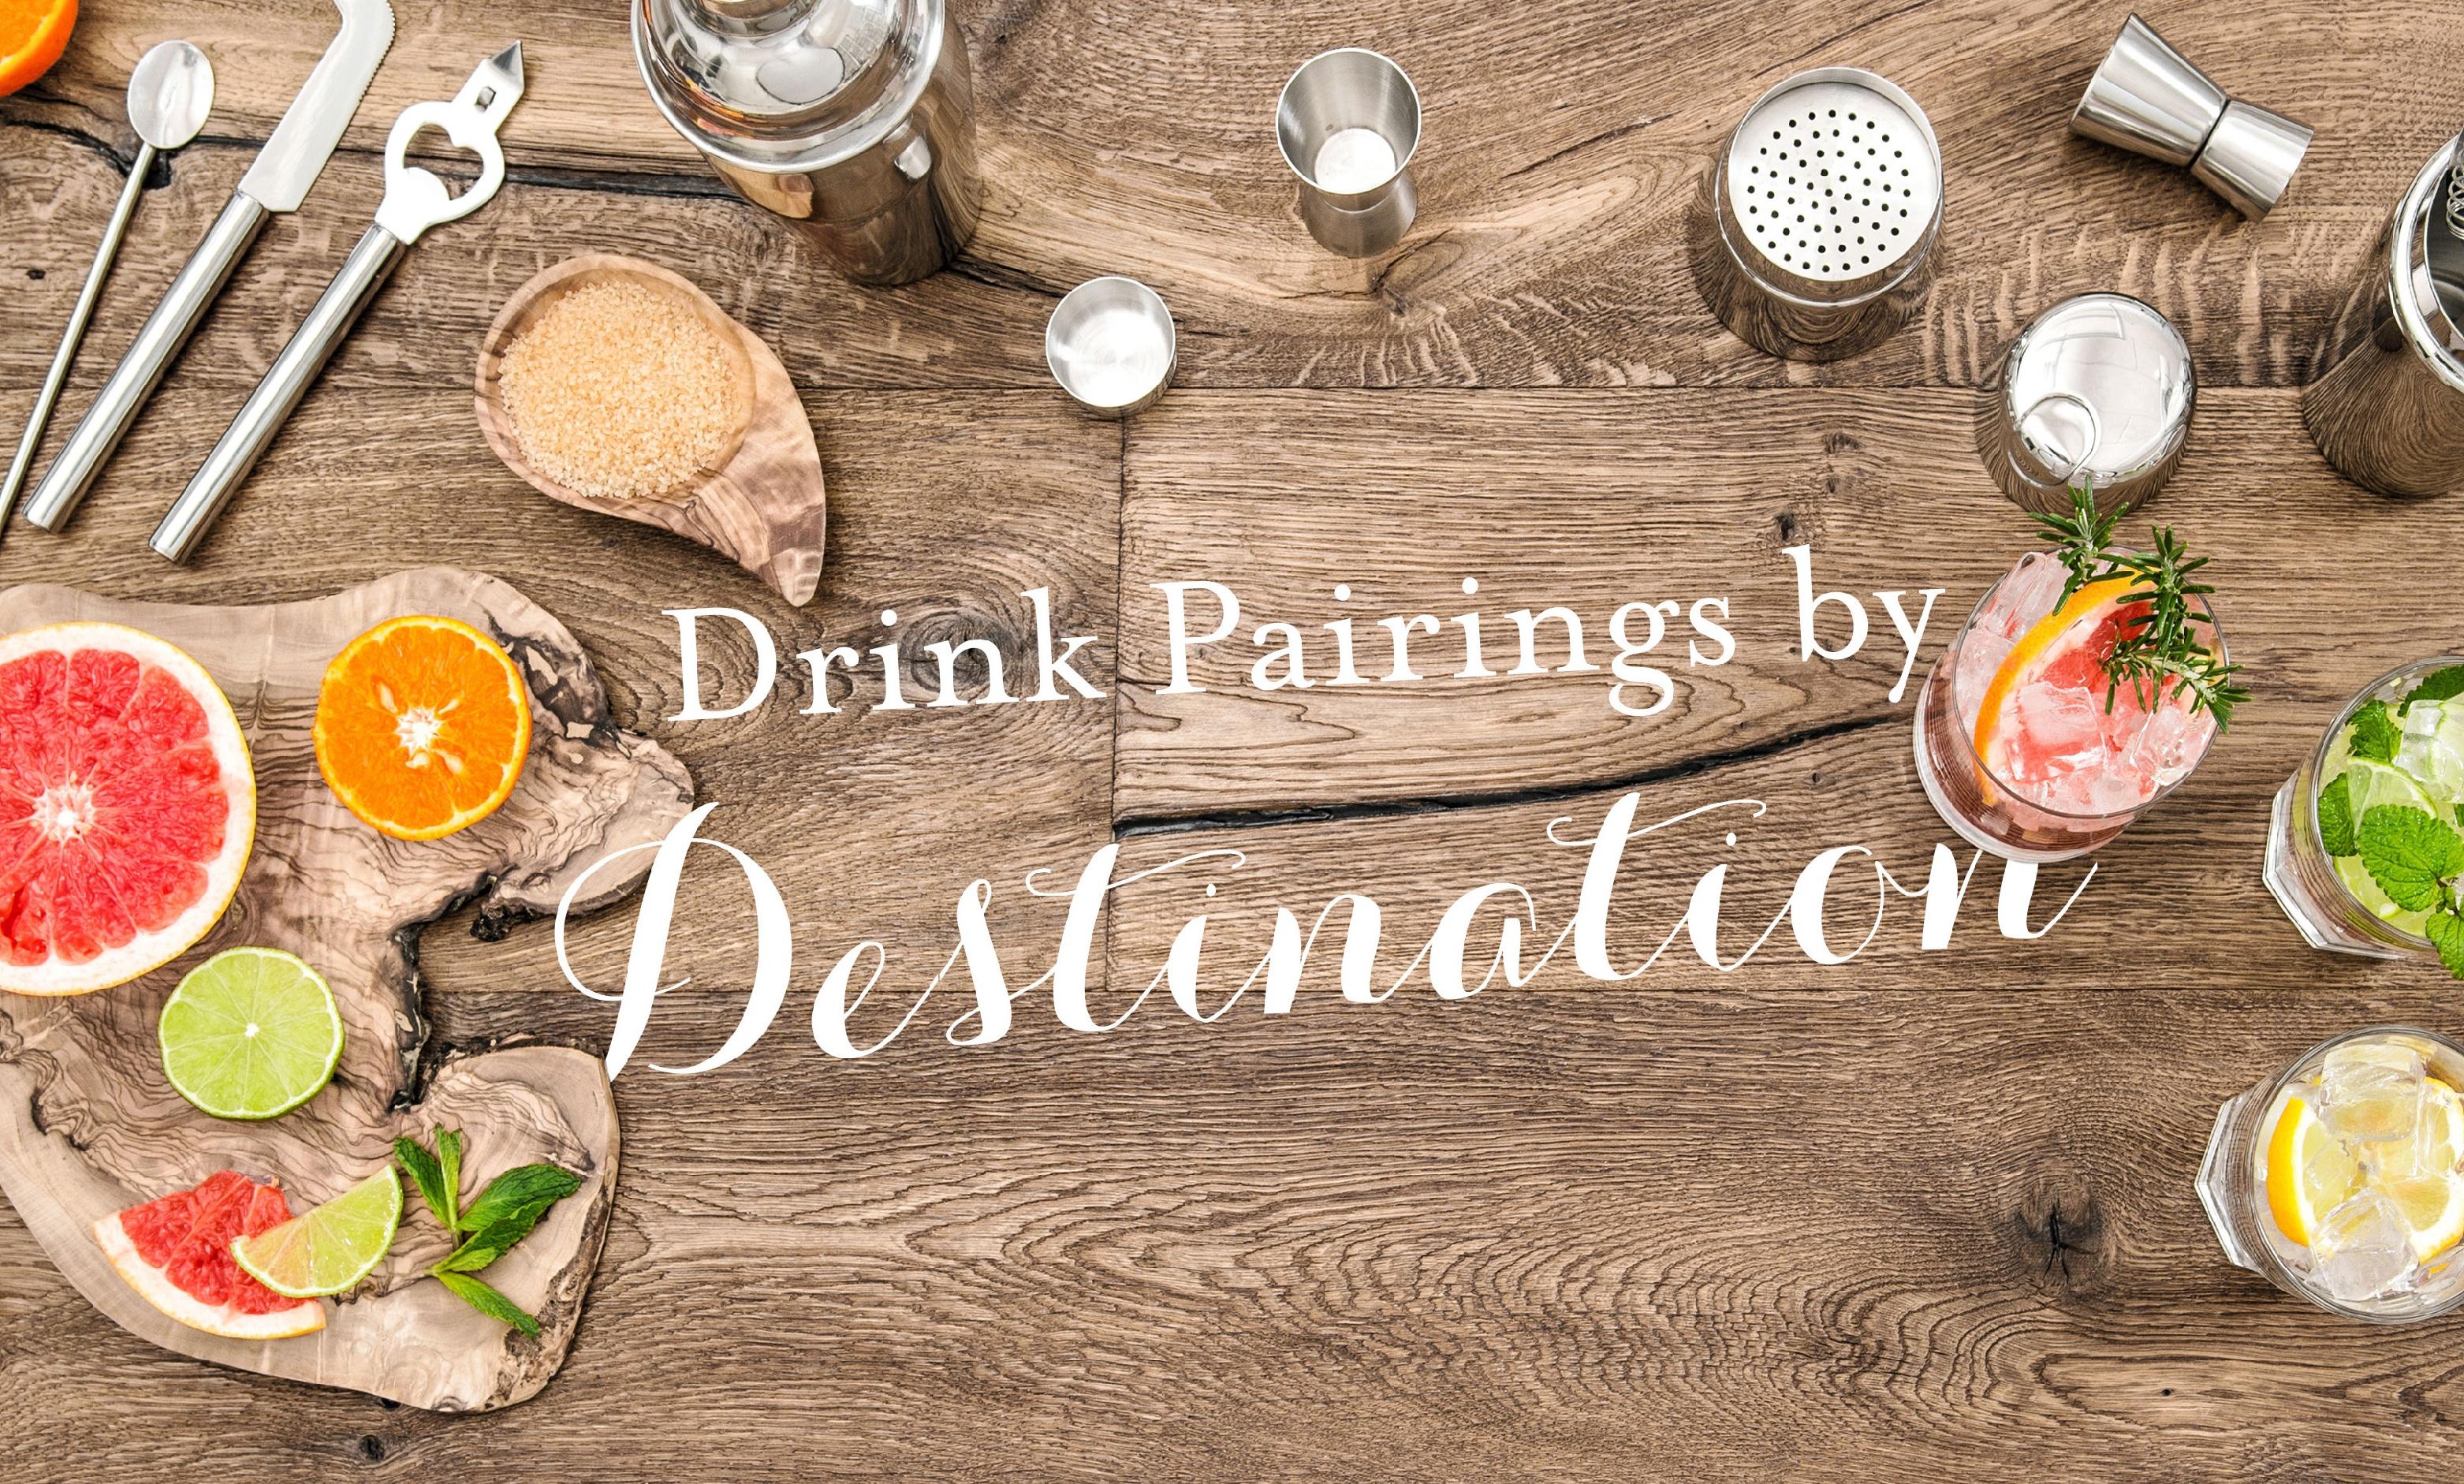 blog_graphics_drink_pairings